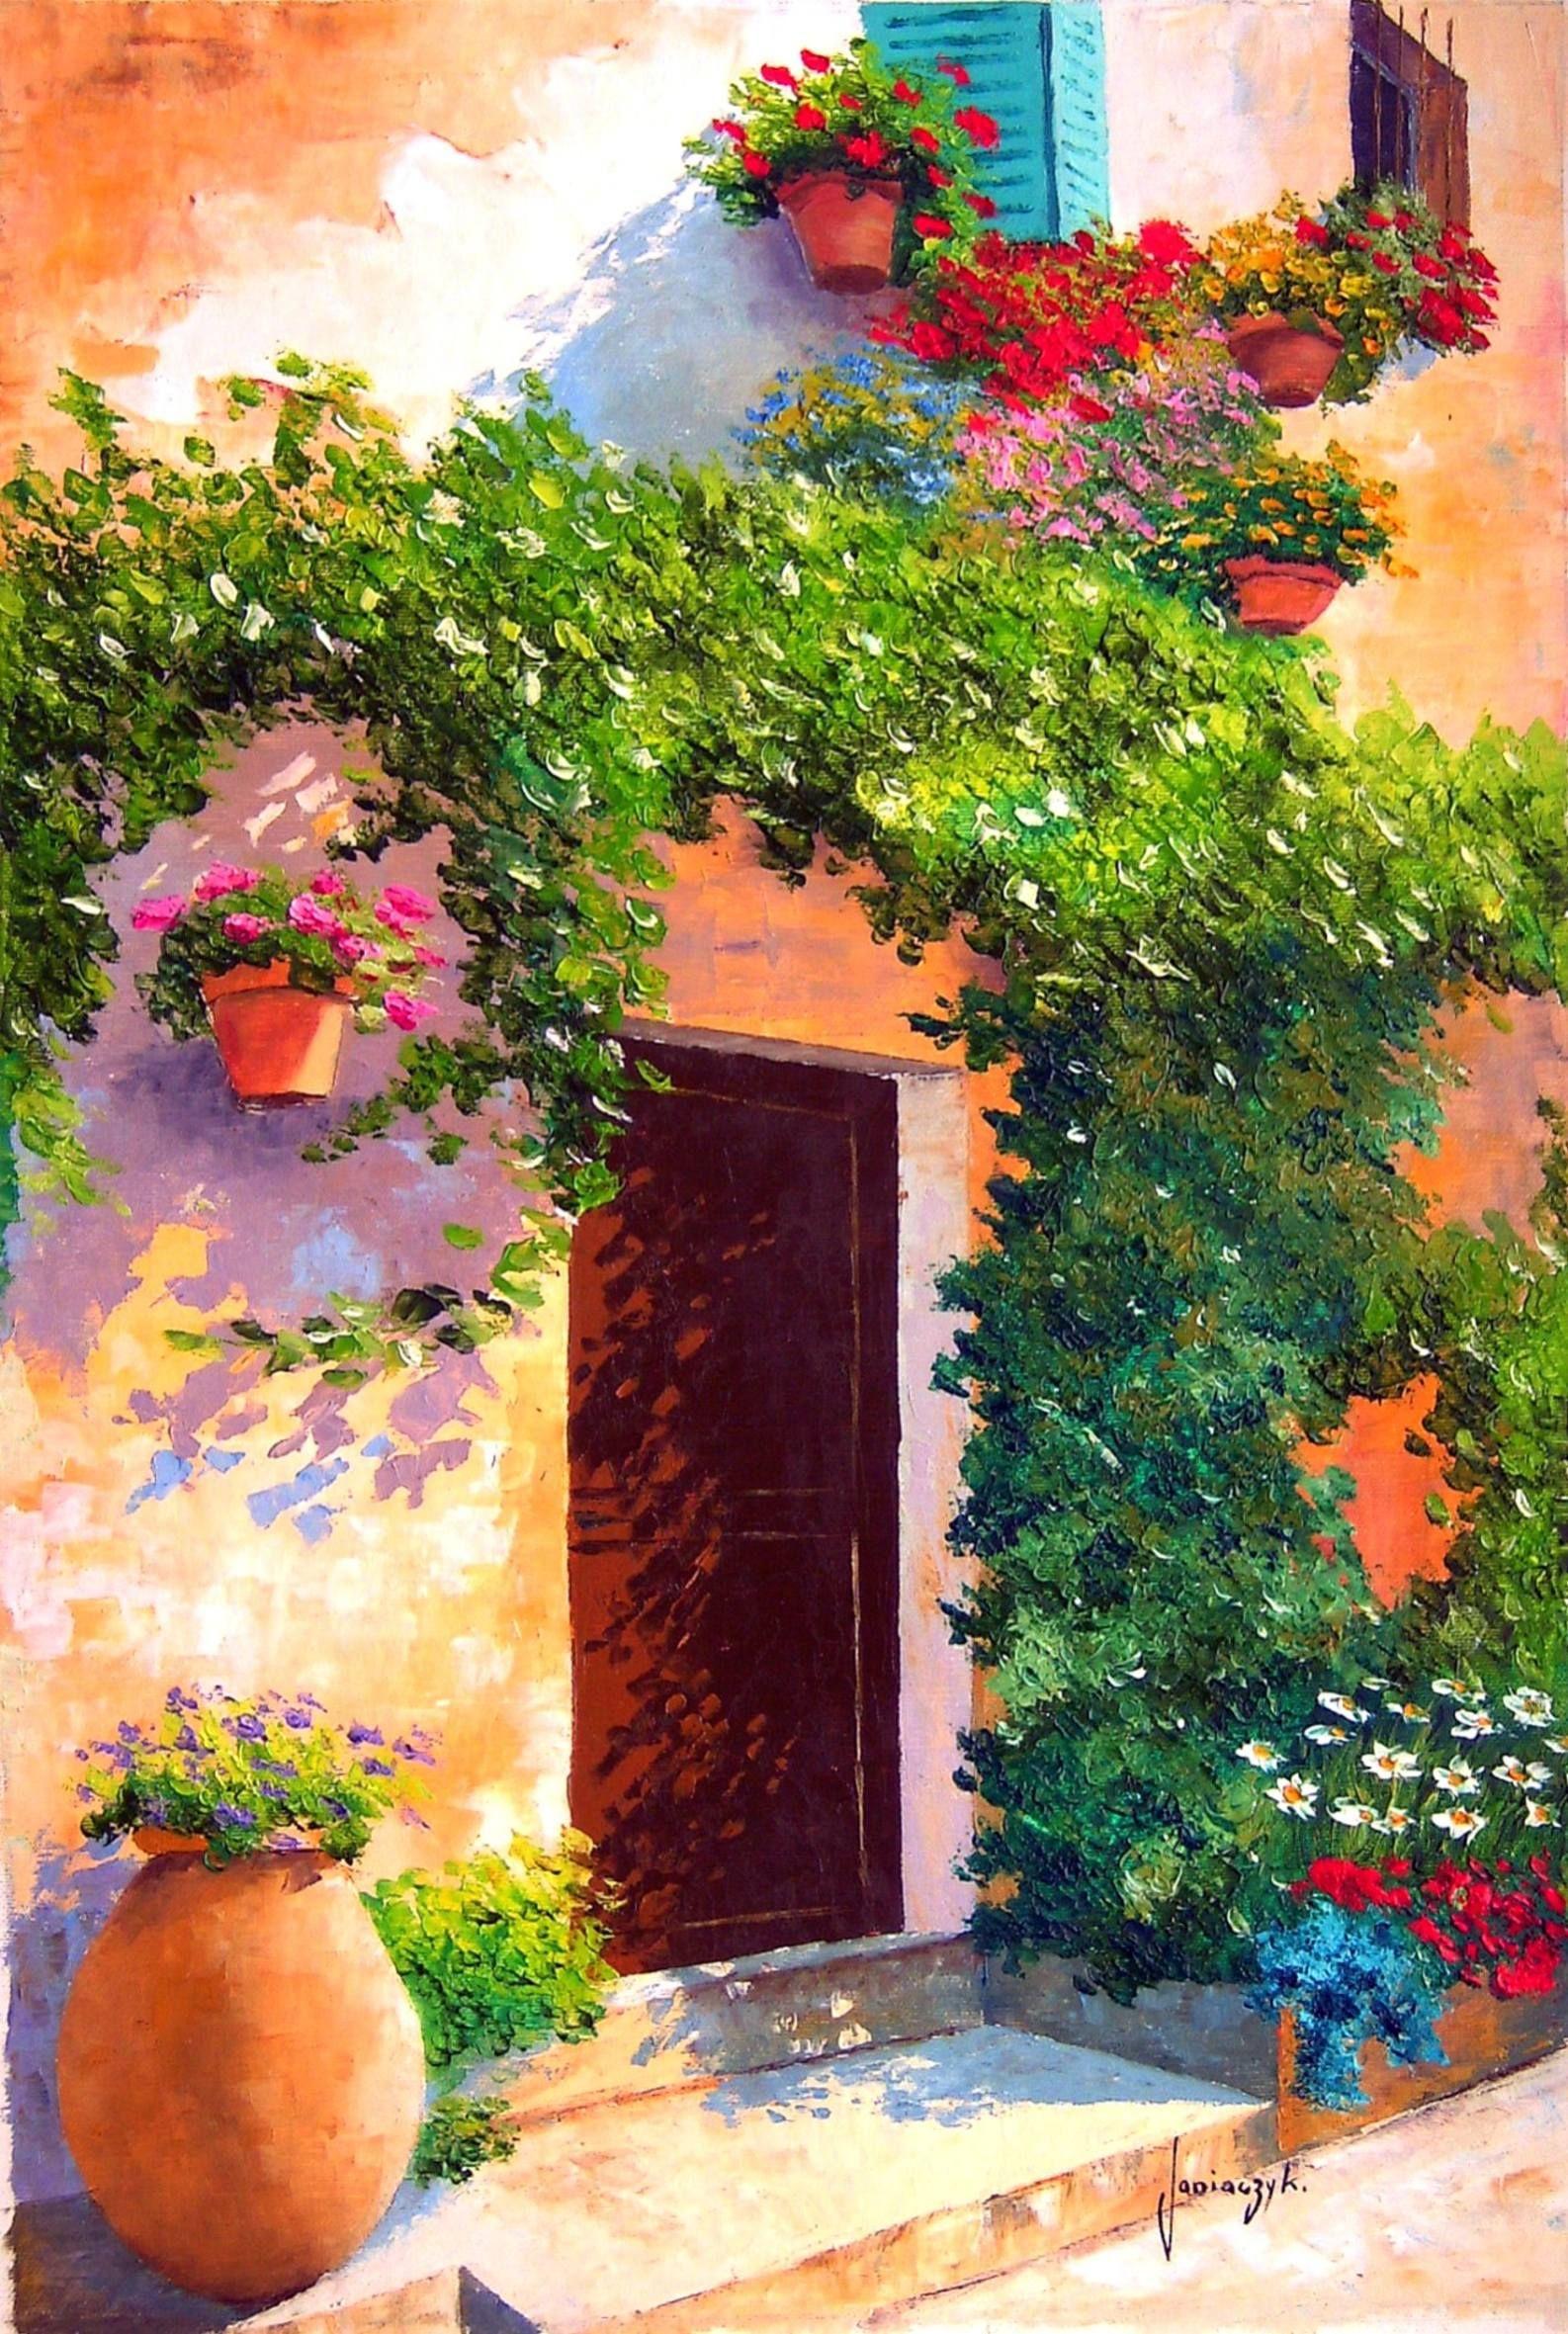 JM JANIACZYK - Façade fleurie - Provence. | paysages peinture ...